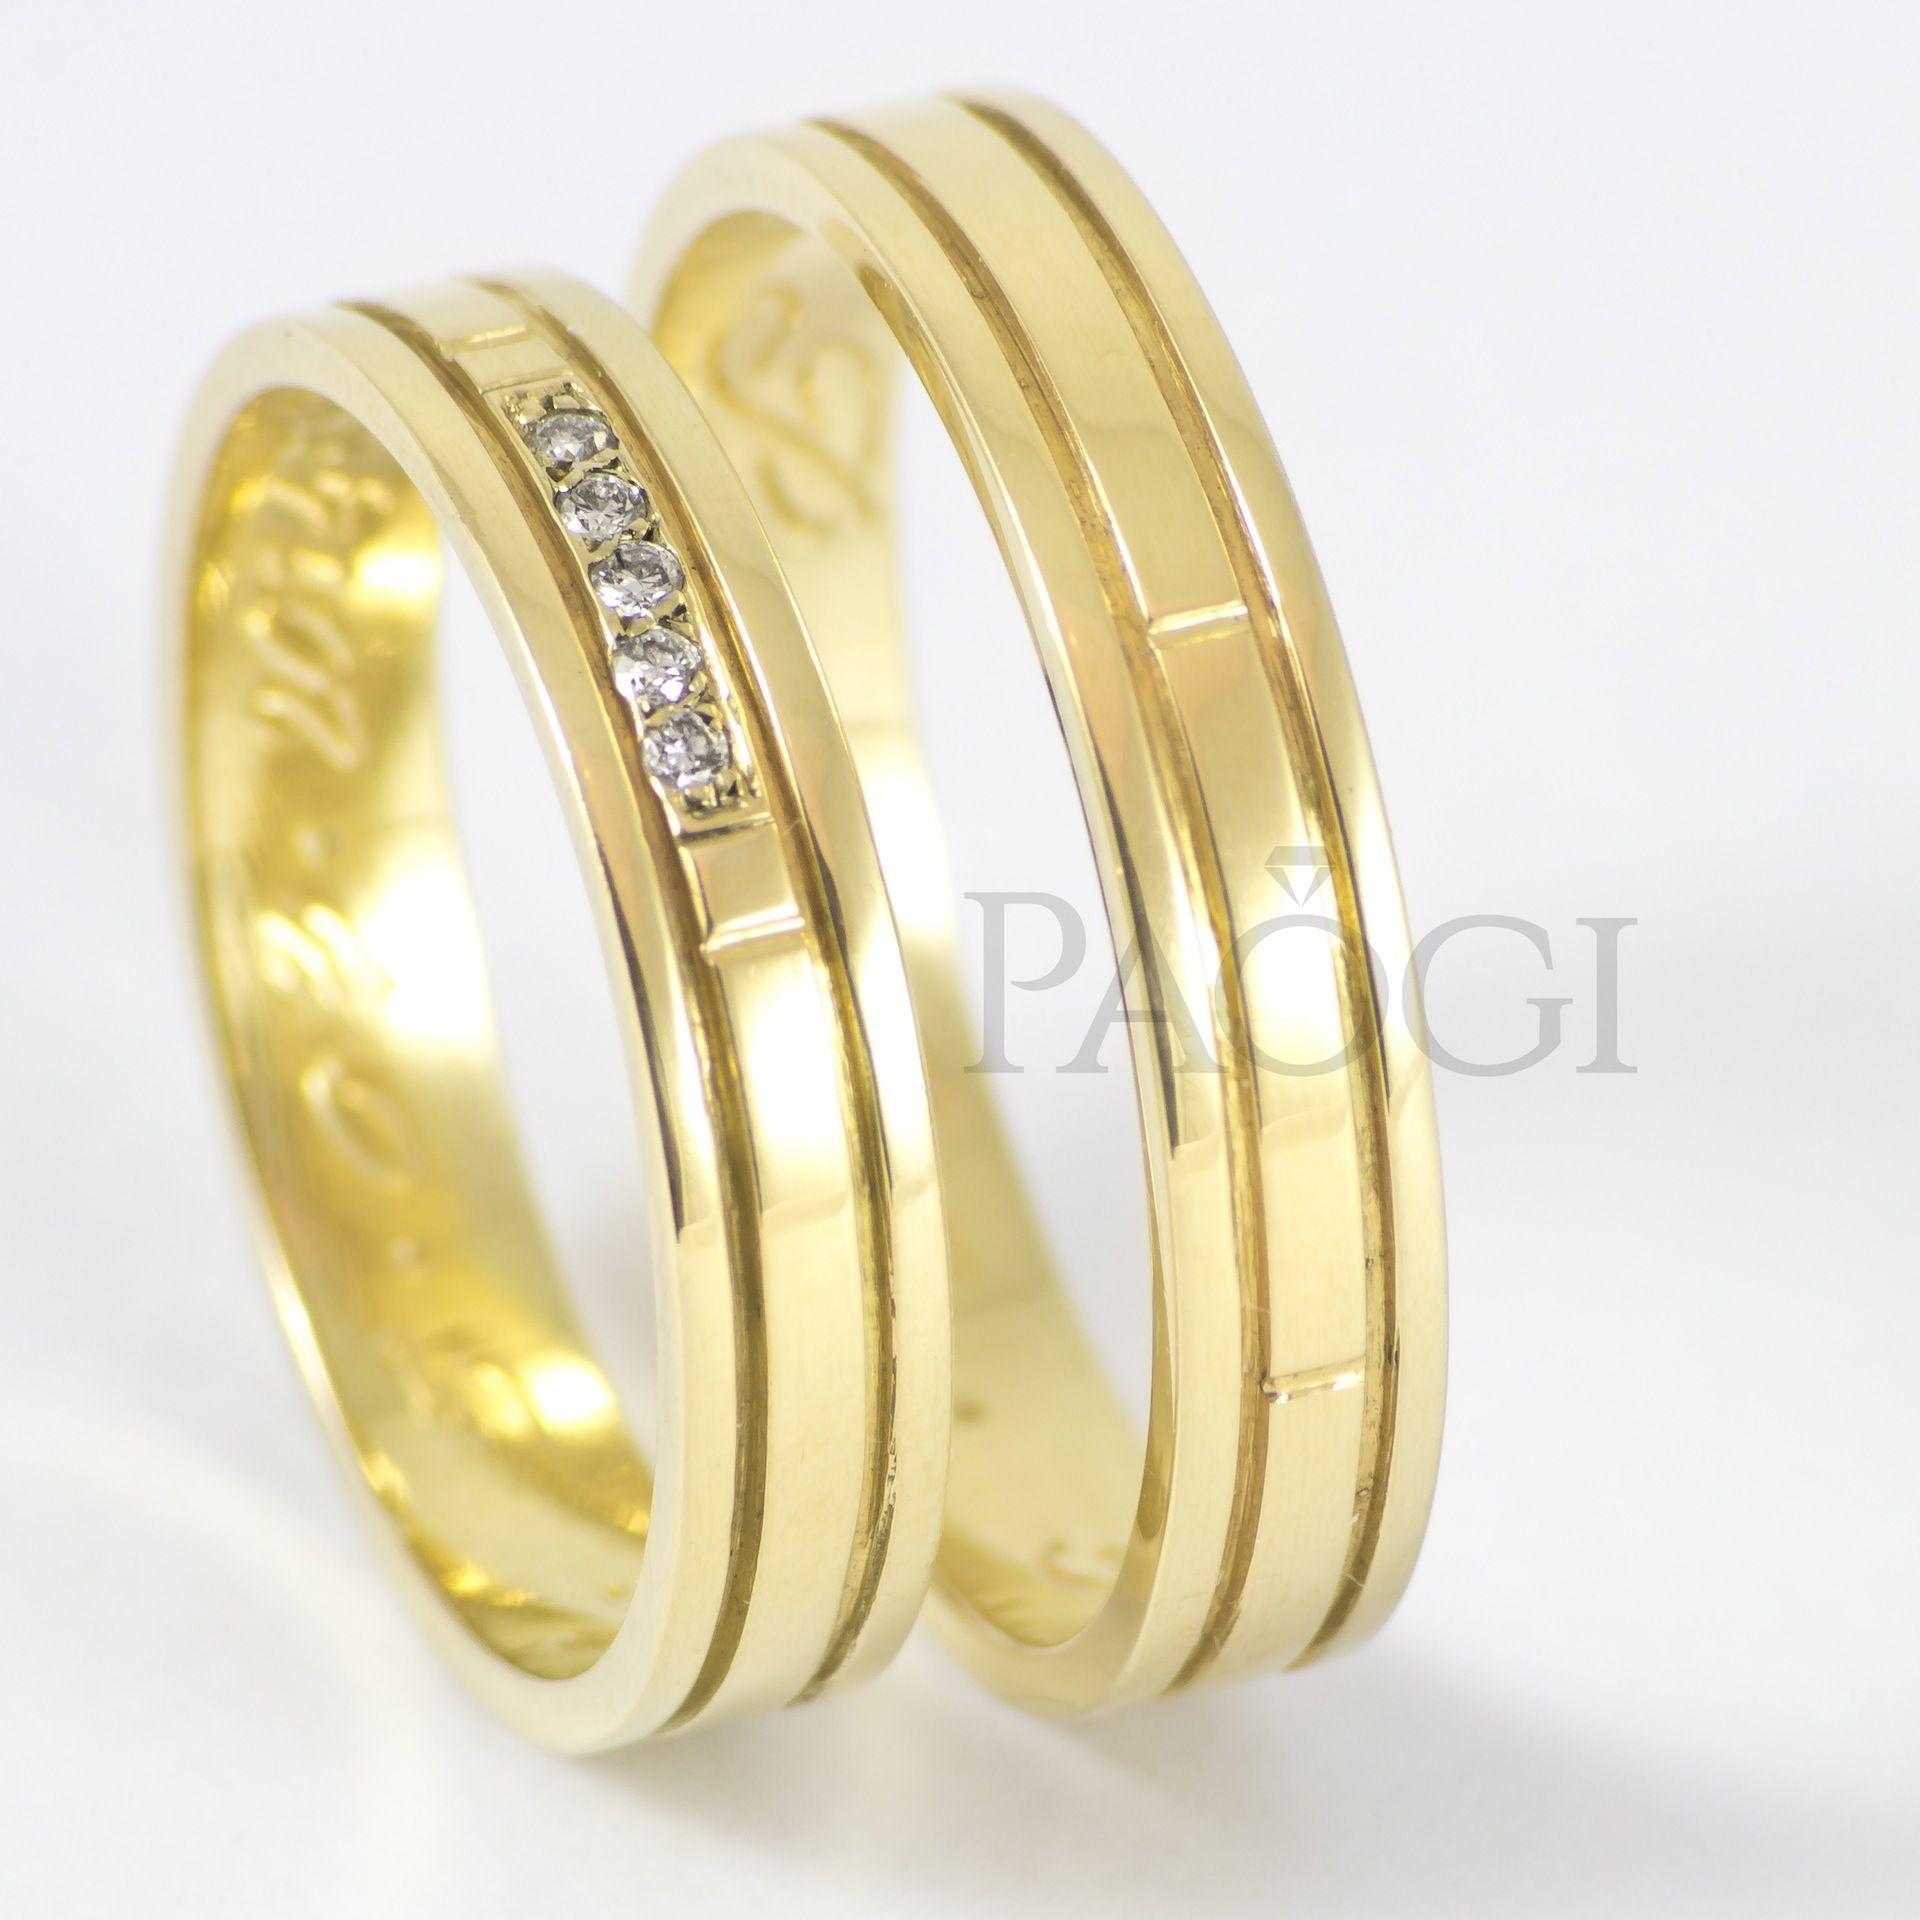 b88d84549a9b PAOGI - Alianzas Cinta con Centro Ancho y Diamantes en Oro Amarillo ...